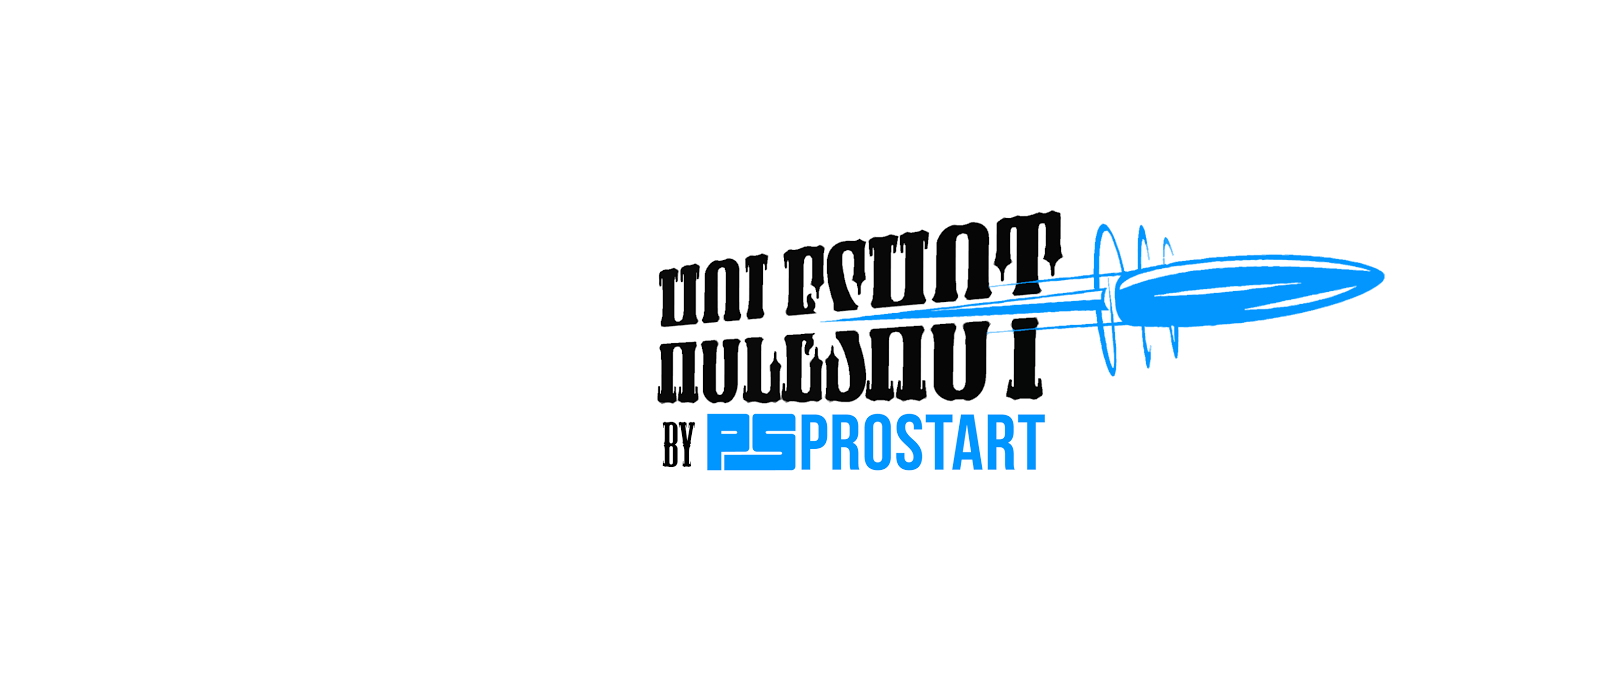 Holeshot by PRO START